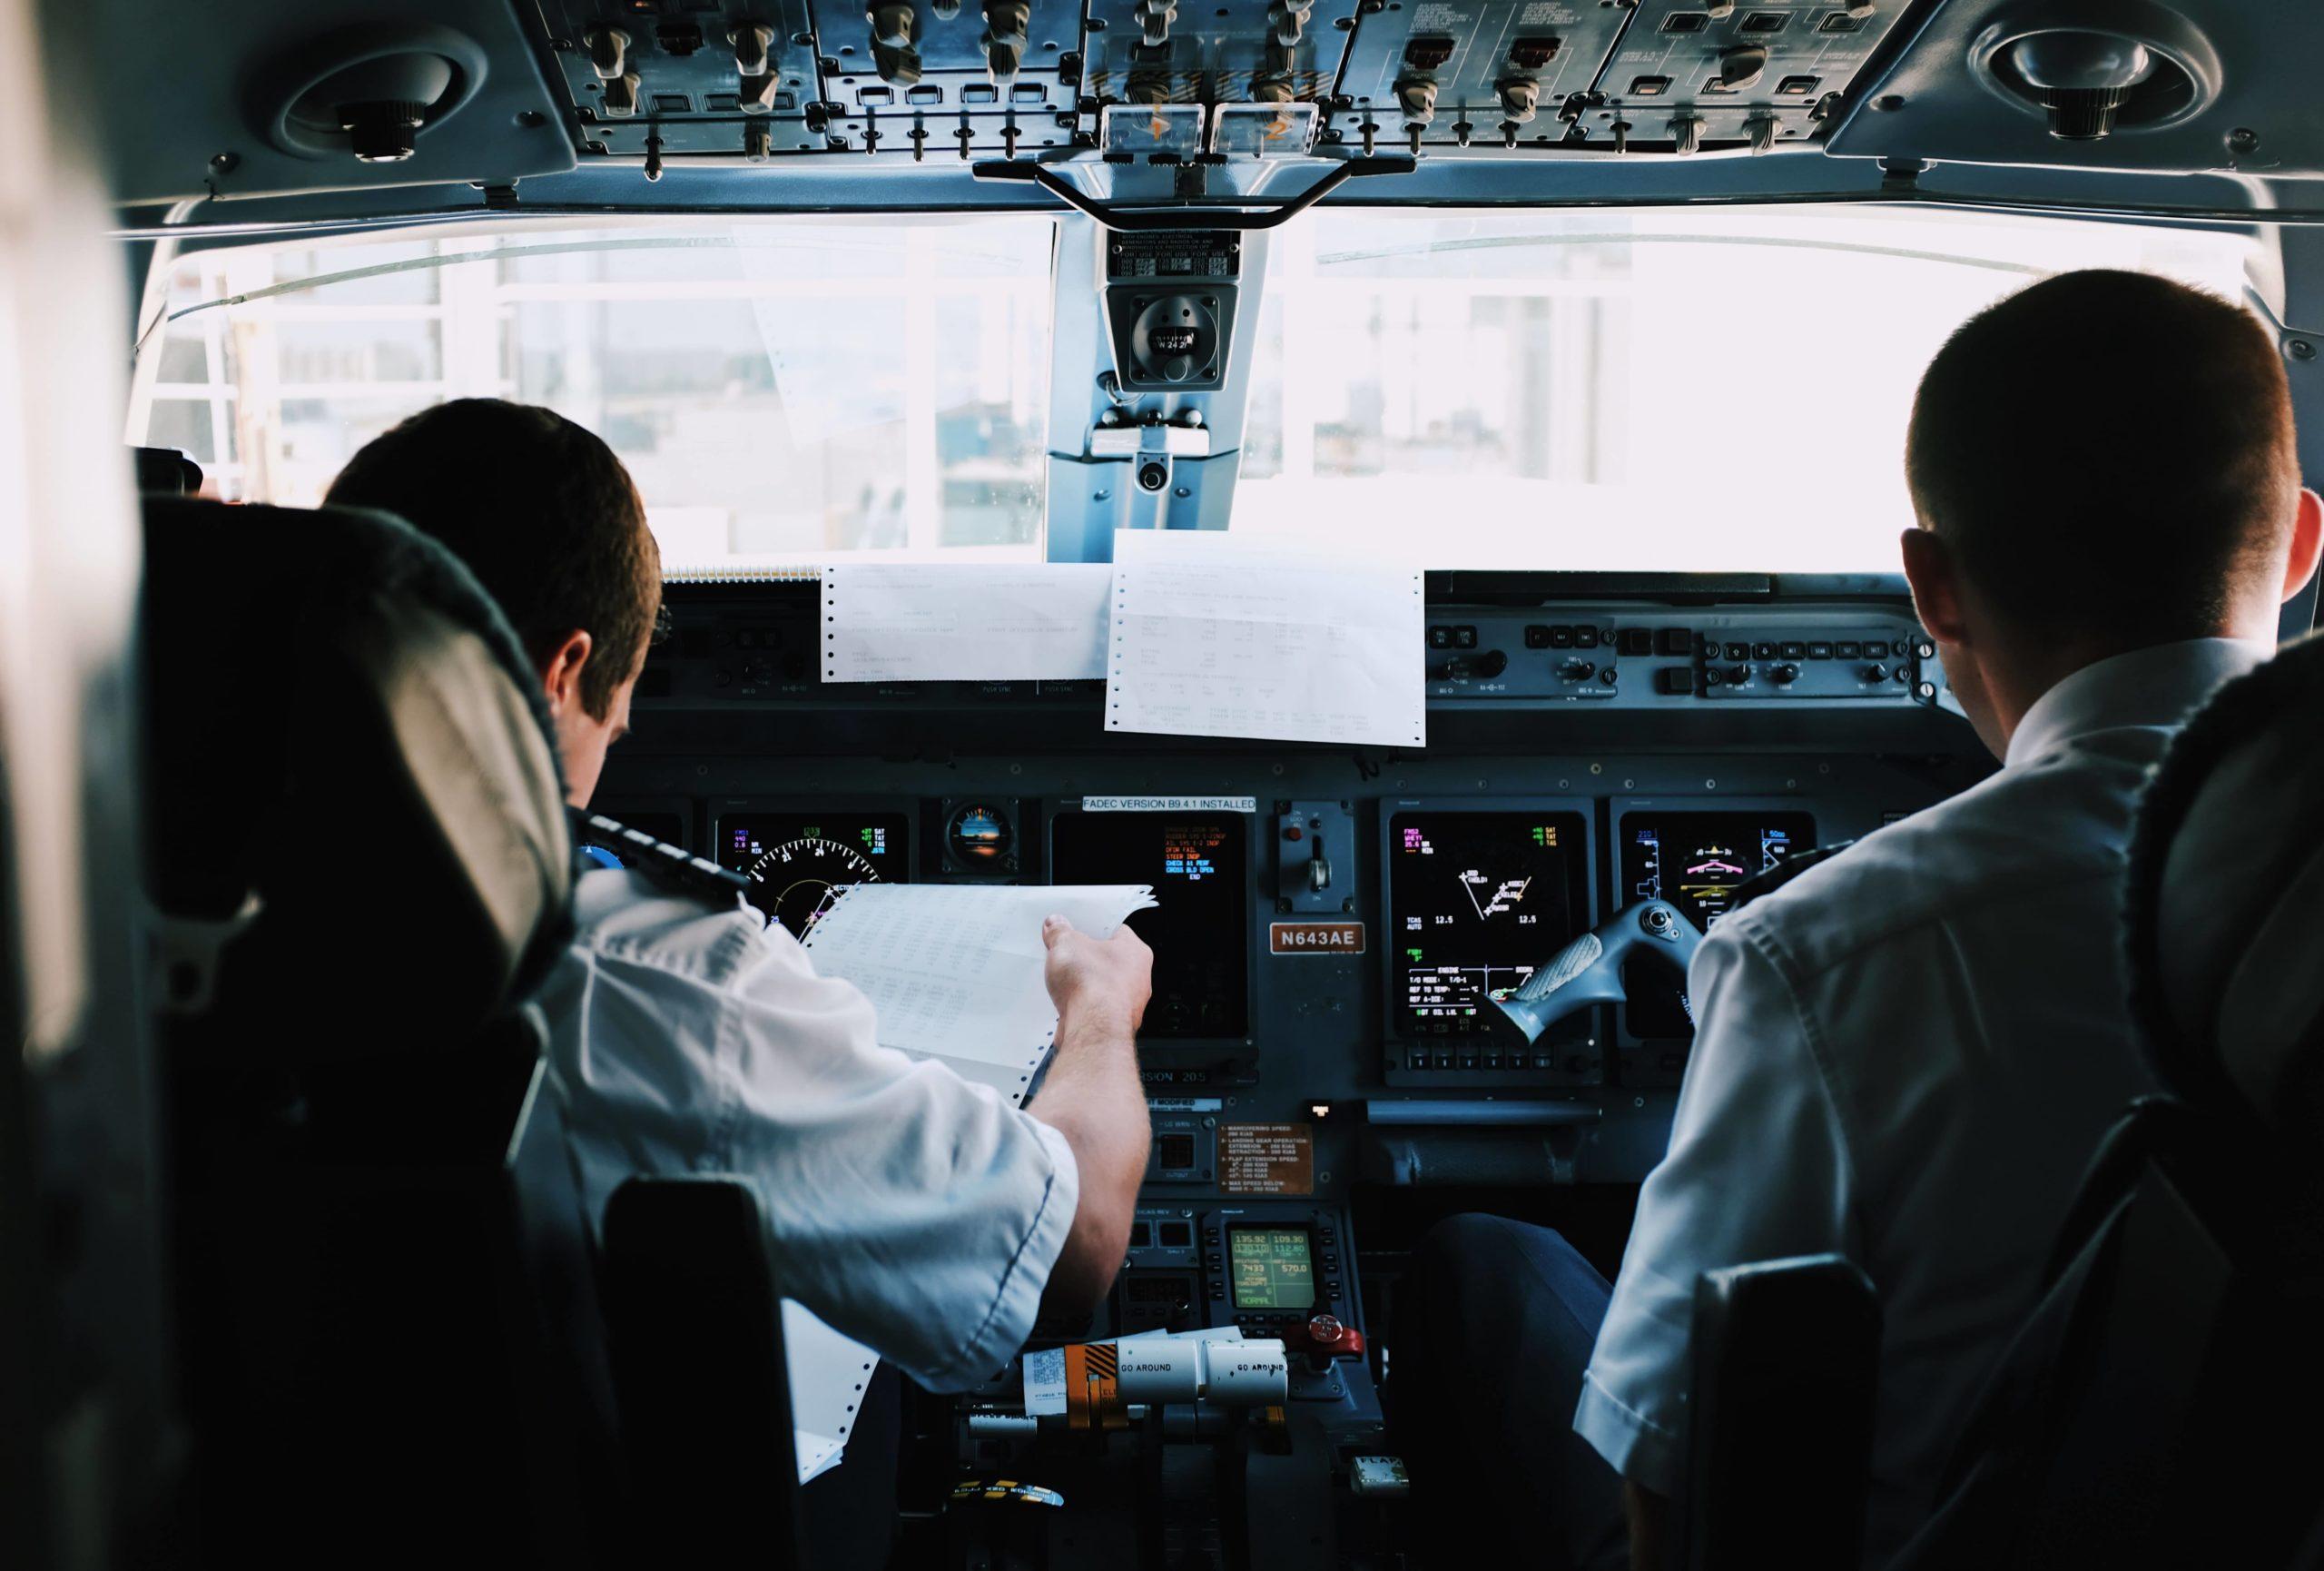 Plane automatic control